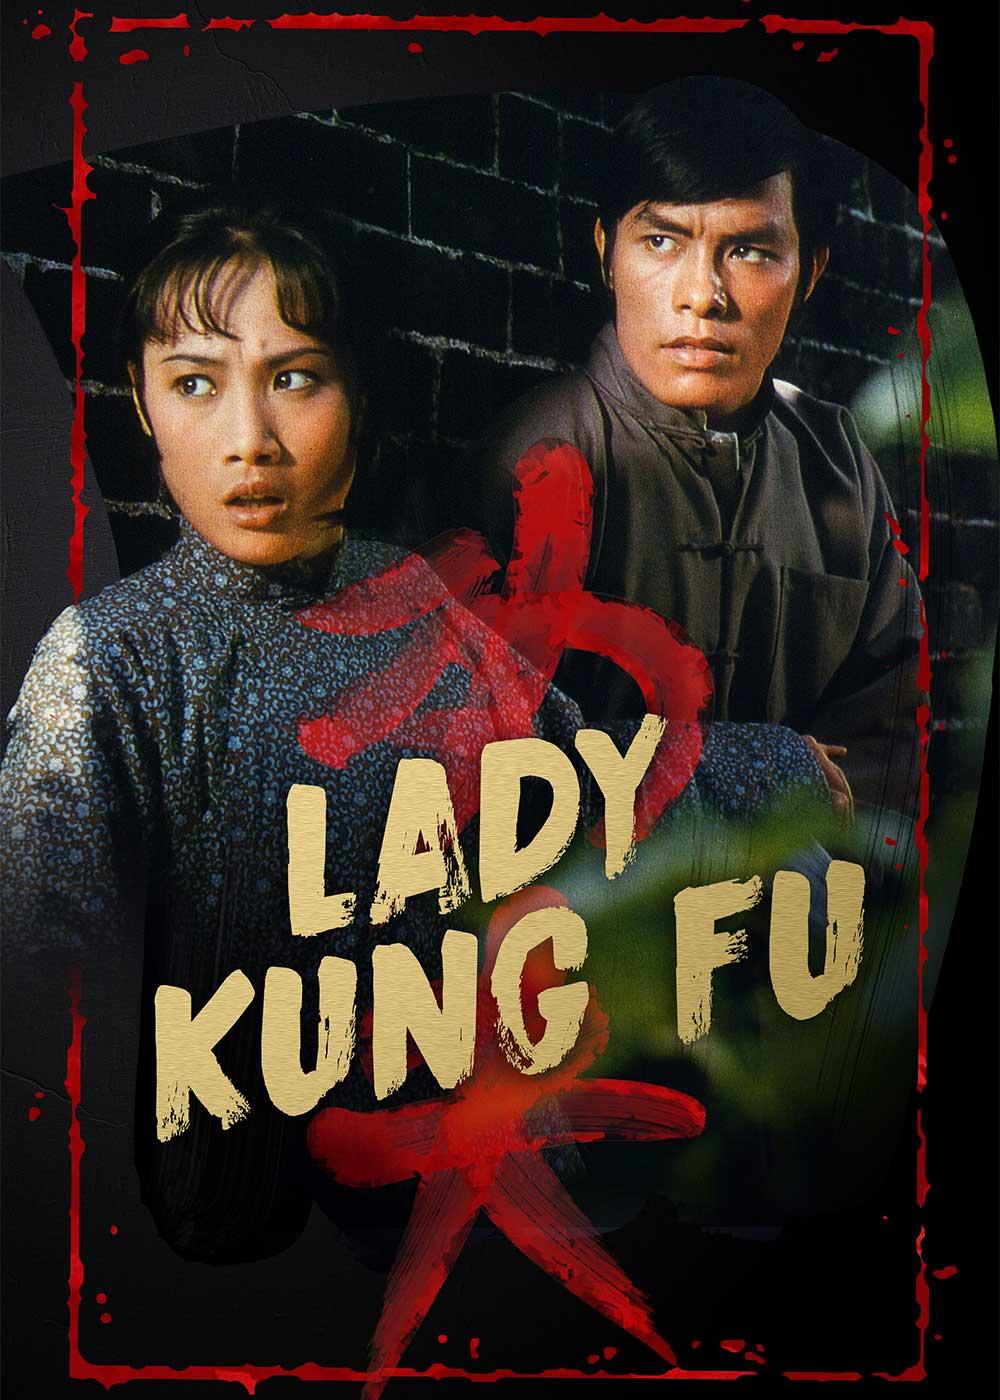 LadyKungFu_poster.jpg